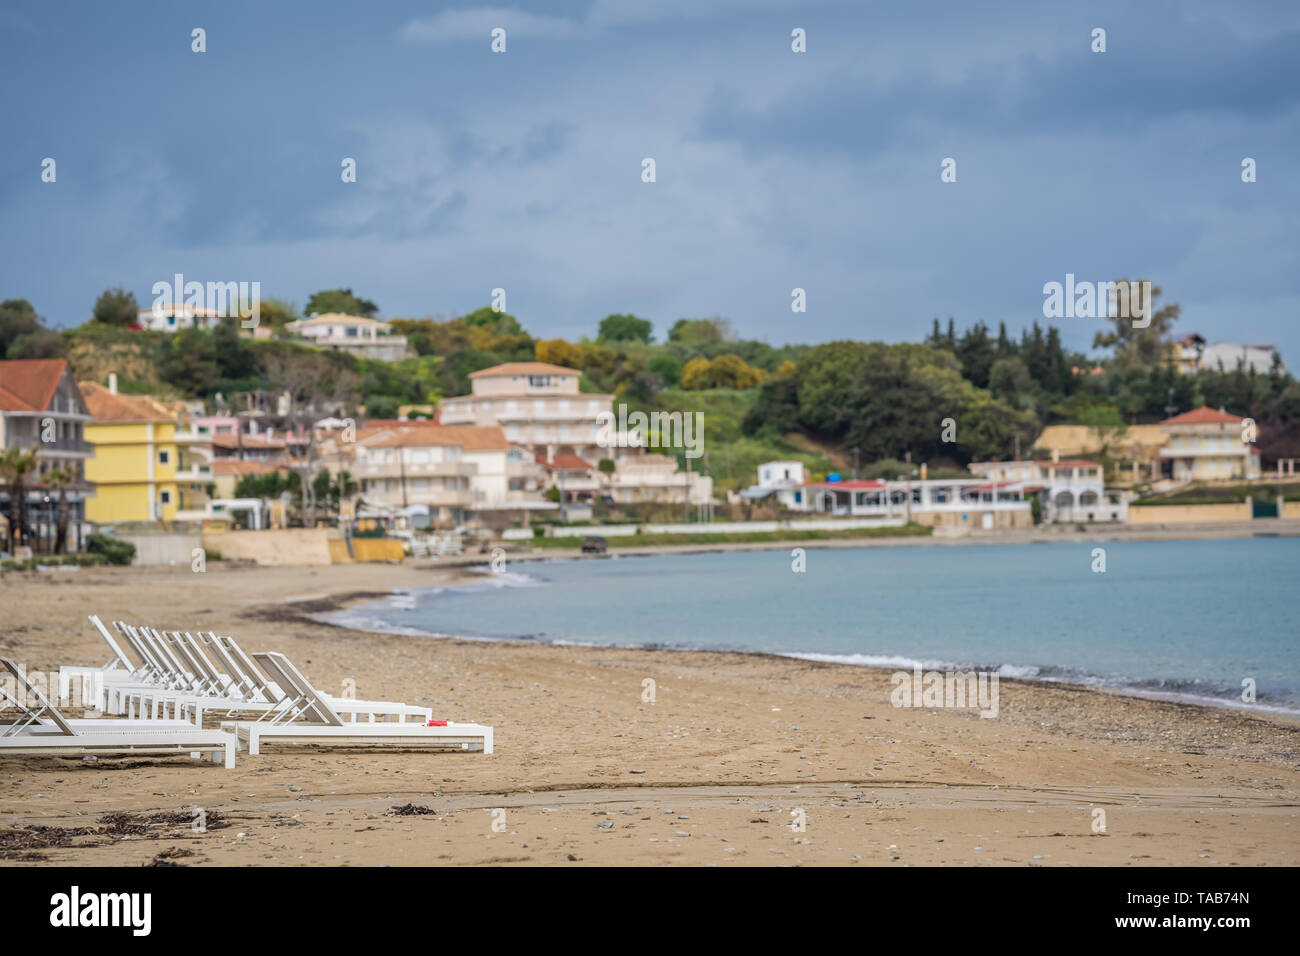 Zakynthos, Greece -  April 2019 : View of the empty white plastic sunbeds on Tsilivi Beach in summer on Zante Island - Stock Image